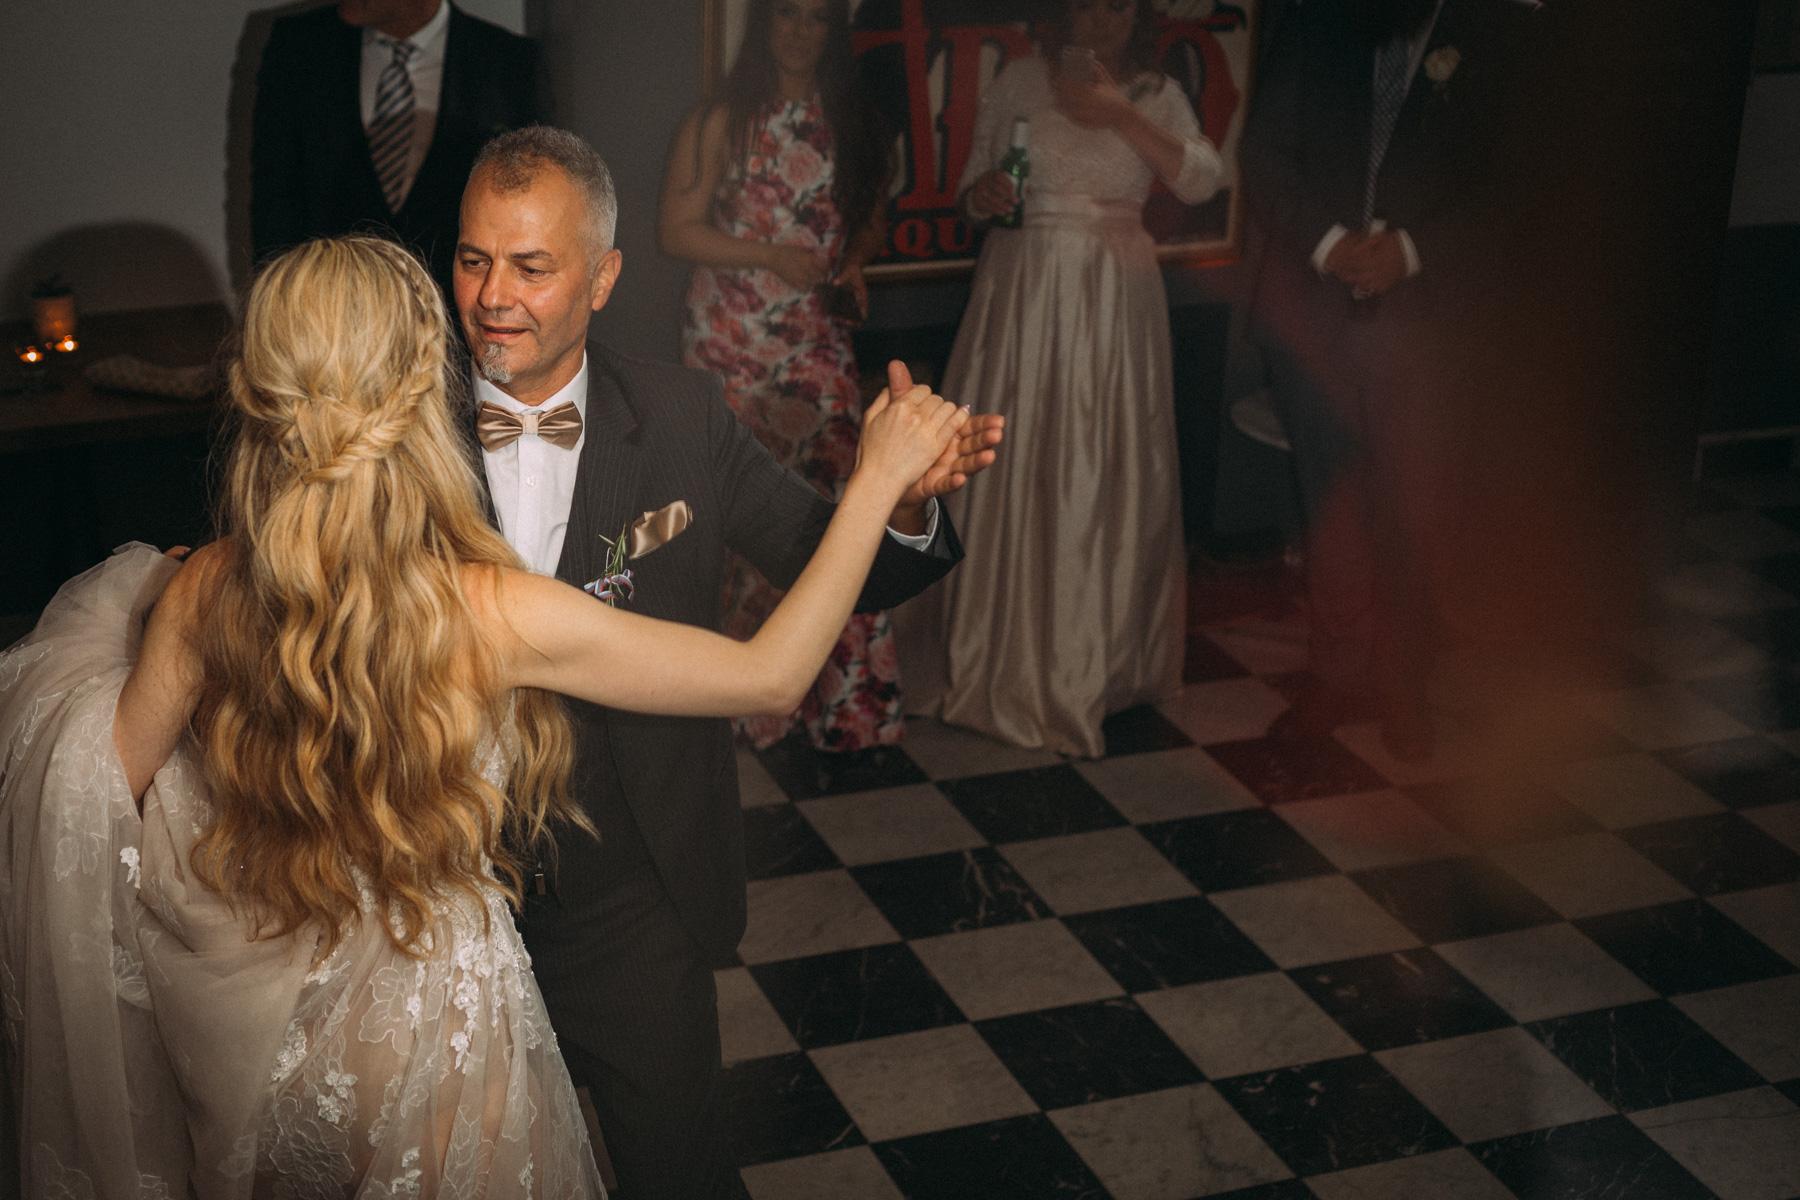 La-Maquette-wedding-by-Toronto-modern-wedding-photographer-Sam-Wong_47.jpg